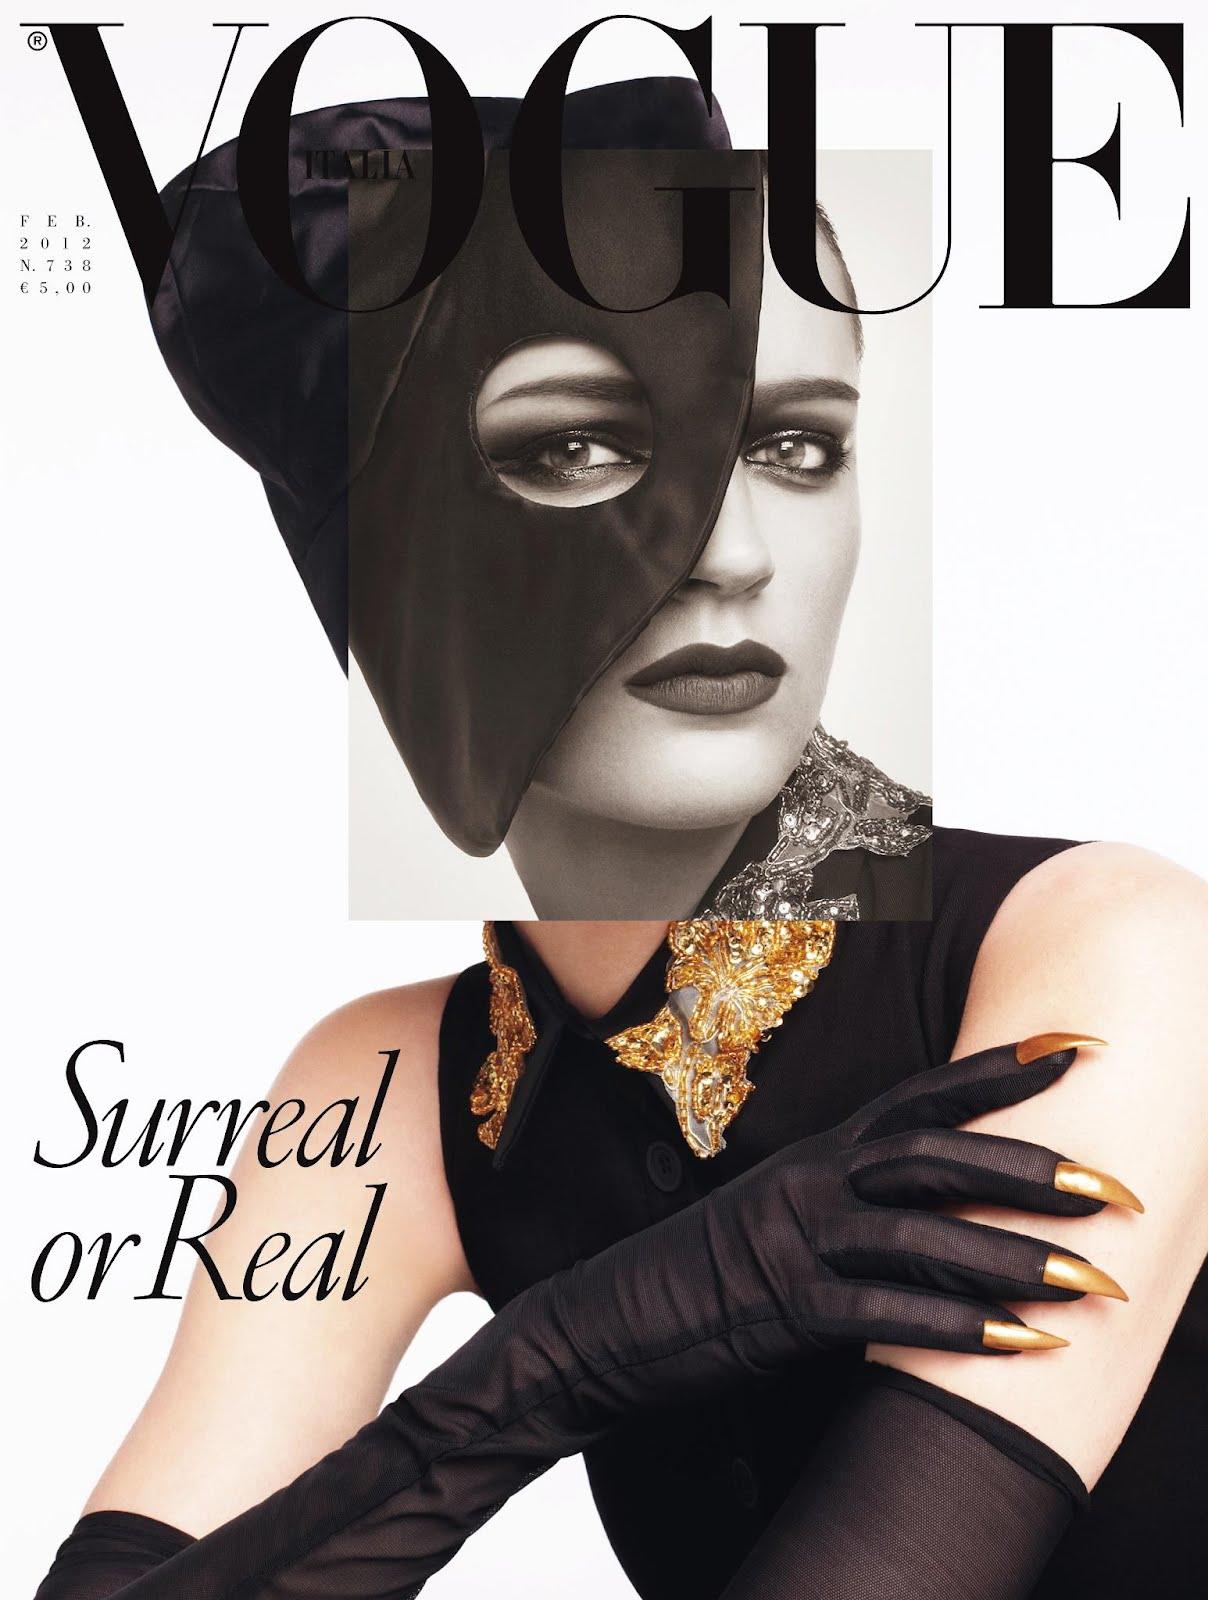 Laura Kampman for Vogue Italia, February 2012; Image: Steven Meisel/Vogue Italia